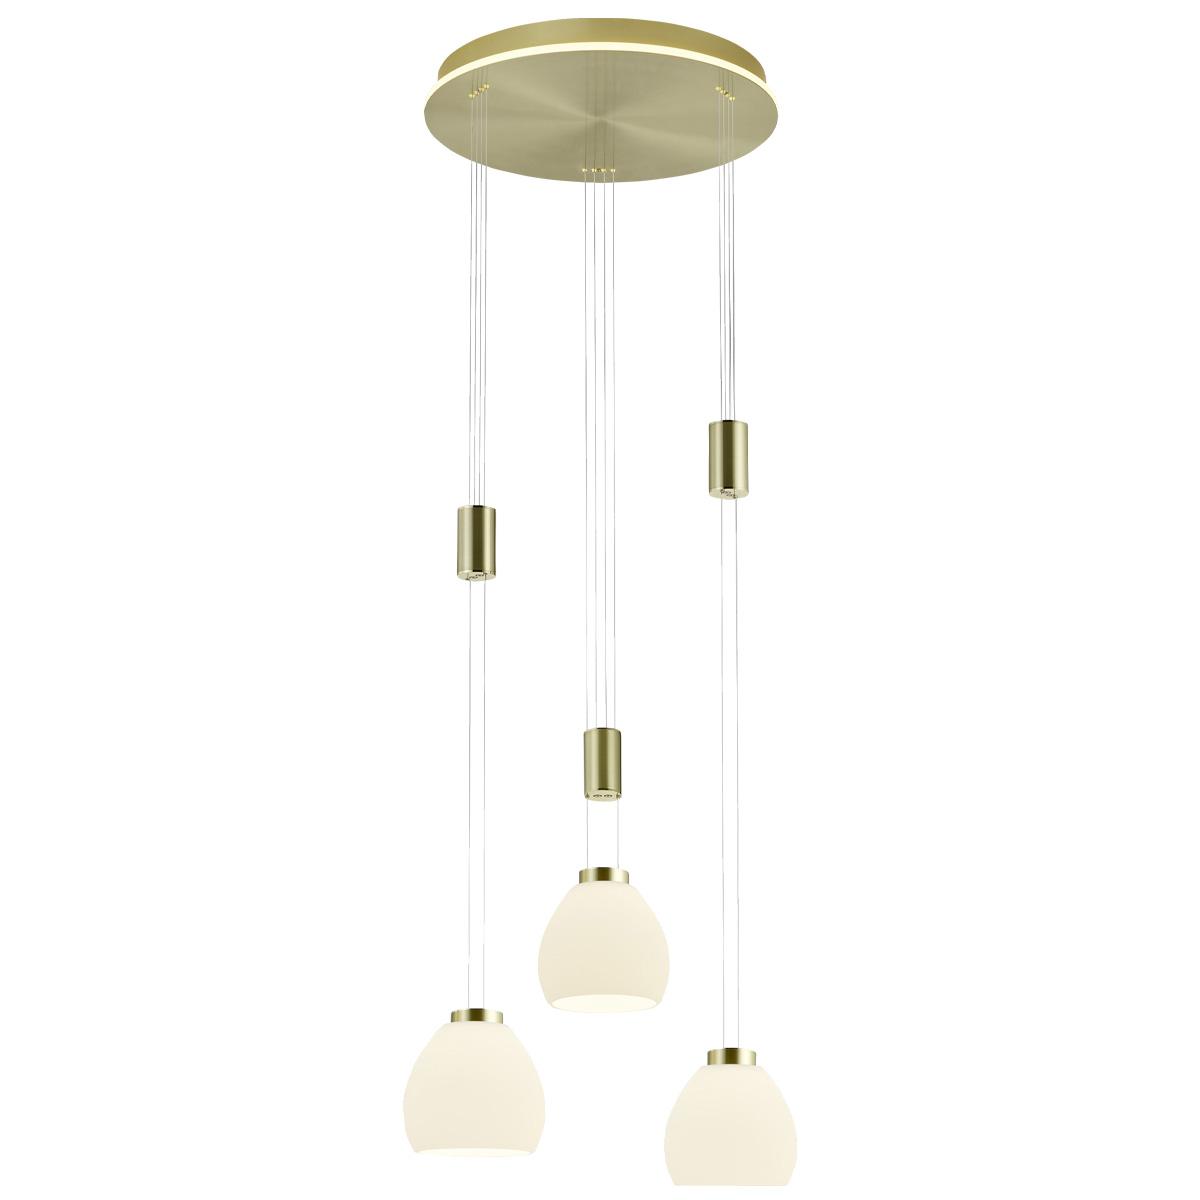 B-Leuchten Sam LED Pendelleuchte, 3-flg., mit Rondell 20454/3-01